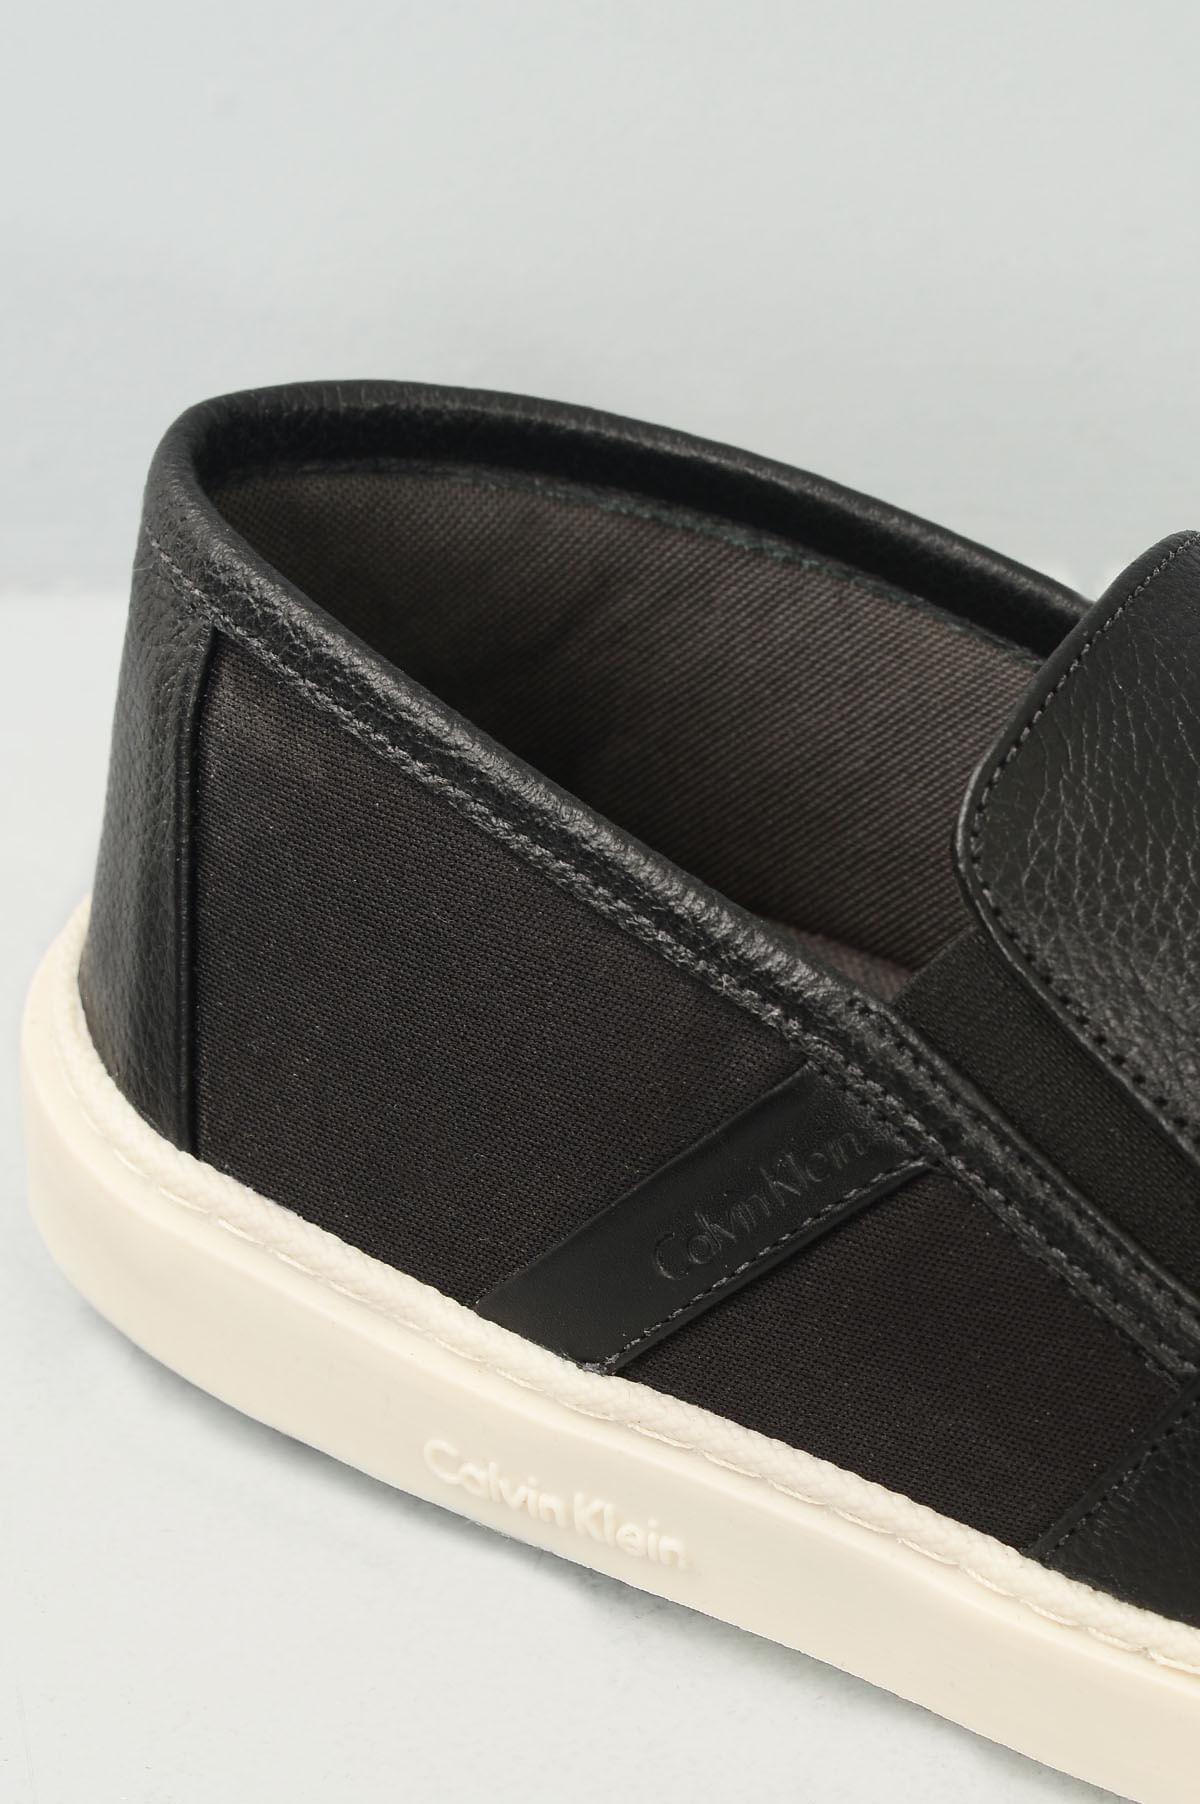 38cef8c7a3f Sapatênis Masculino Calvin Klein Olavo CR-PRETO - Mundial Calçados